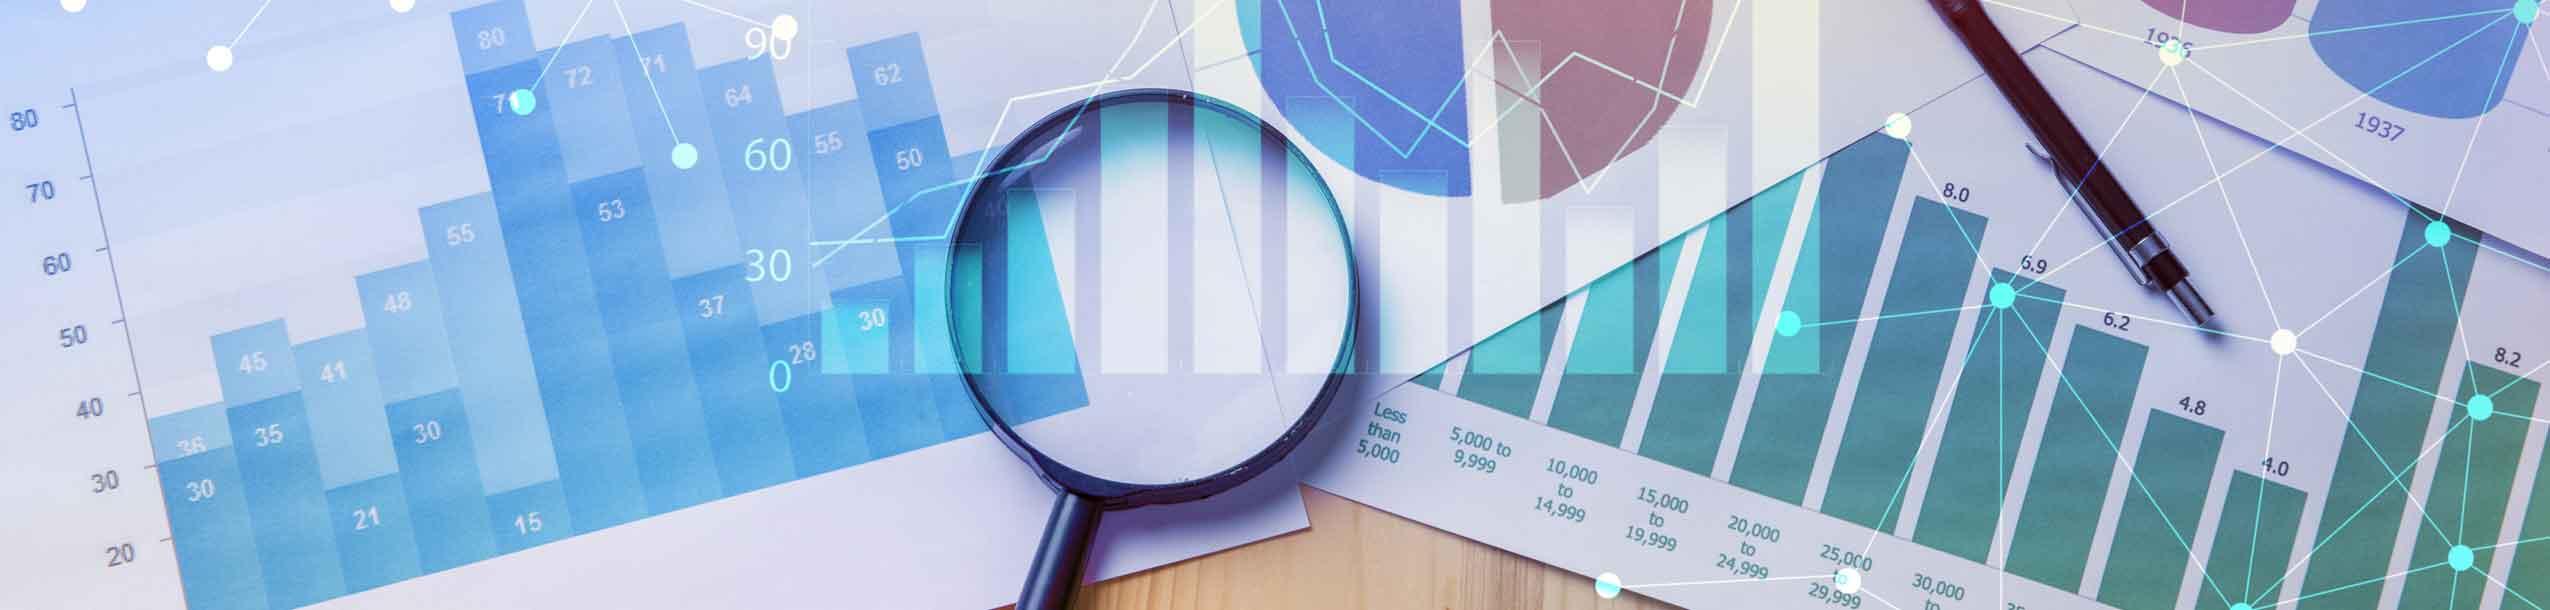 Solvaire Technologies Alternative Legal Provider Dilligence